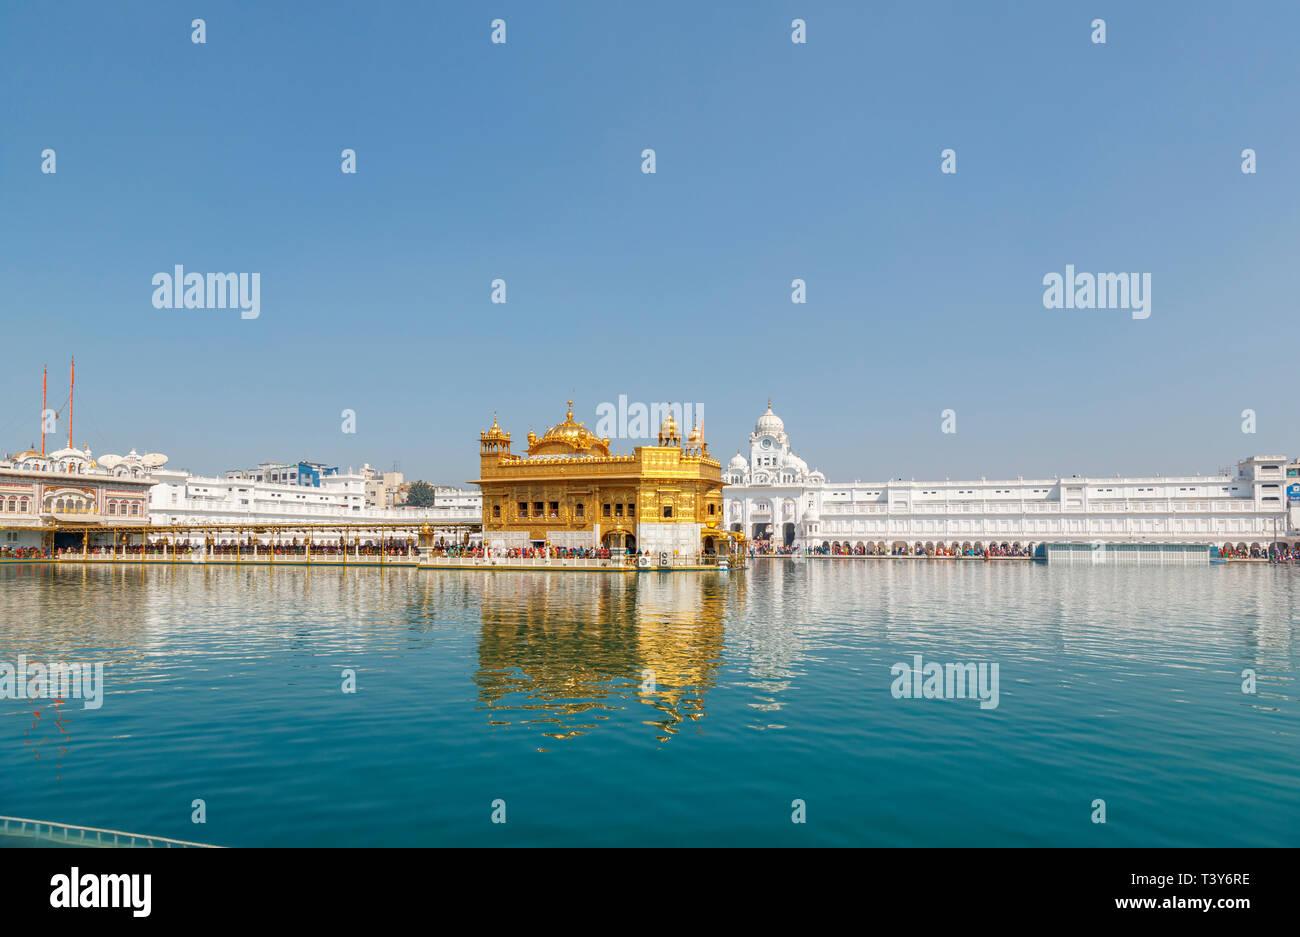 Golden Temple of Amritsar, pool and the Causeway (Sri Harmandir Sahib, Darbar Sahib), the holiest pilgrimage site of Sikhism, Amritsar, Punjab, India - Stock Image